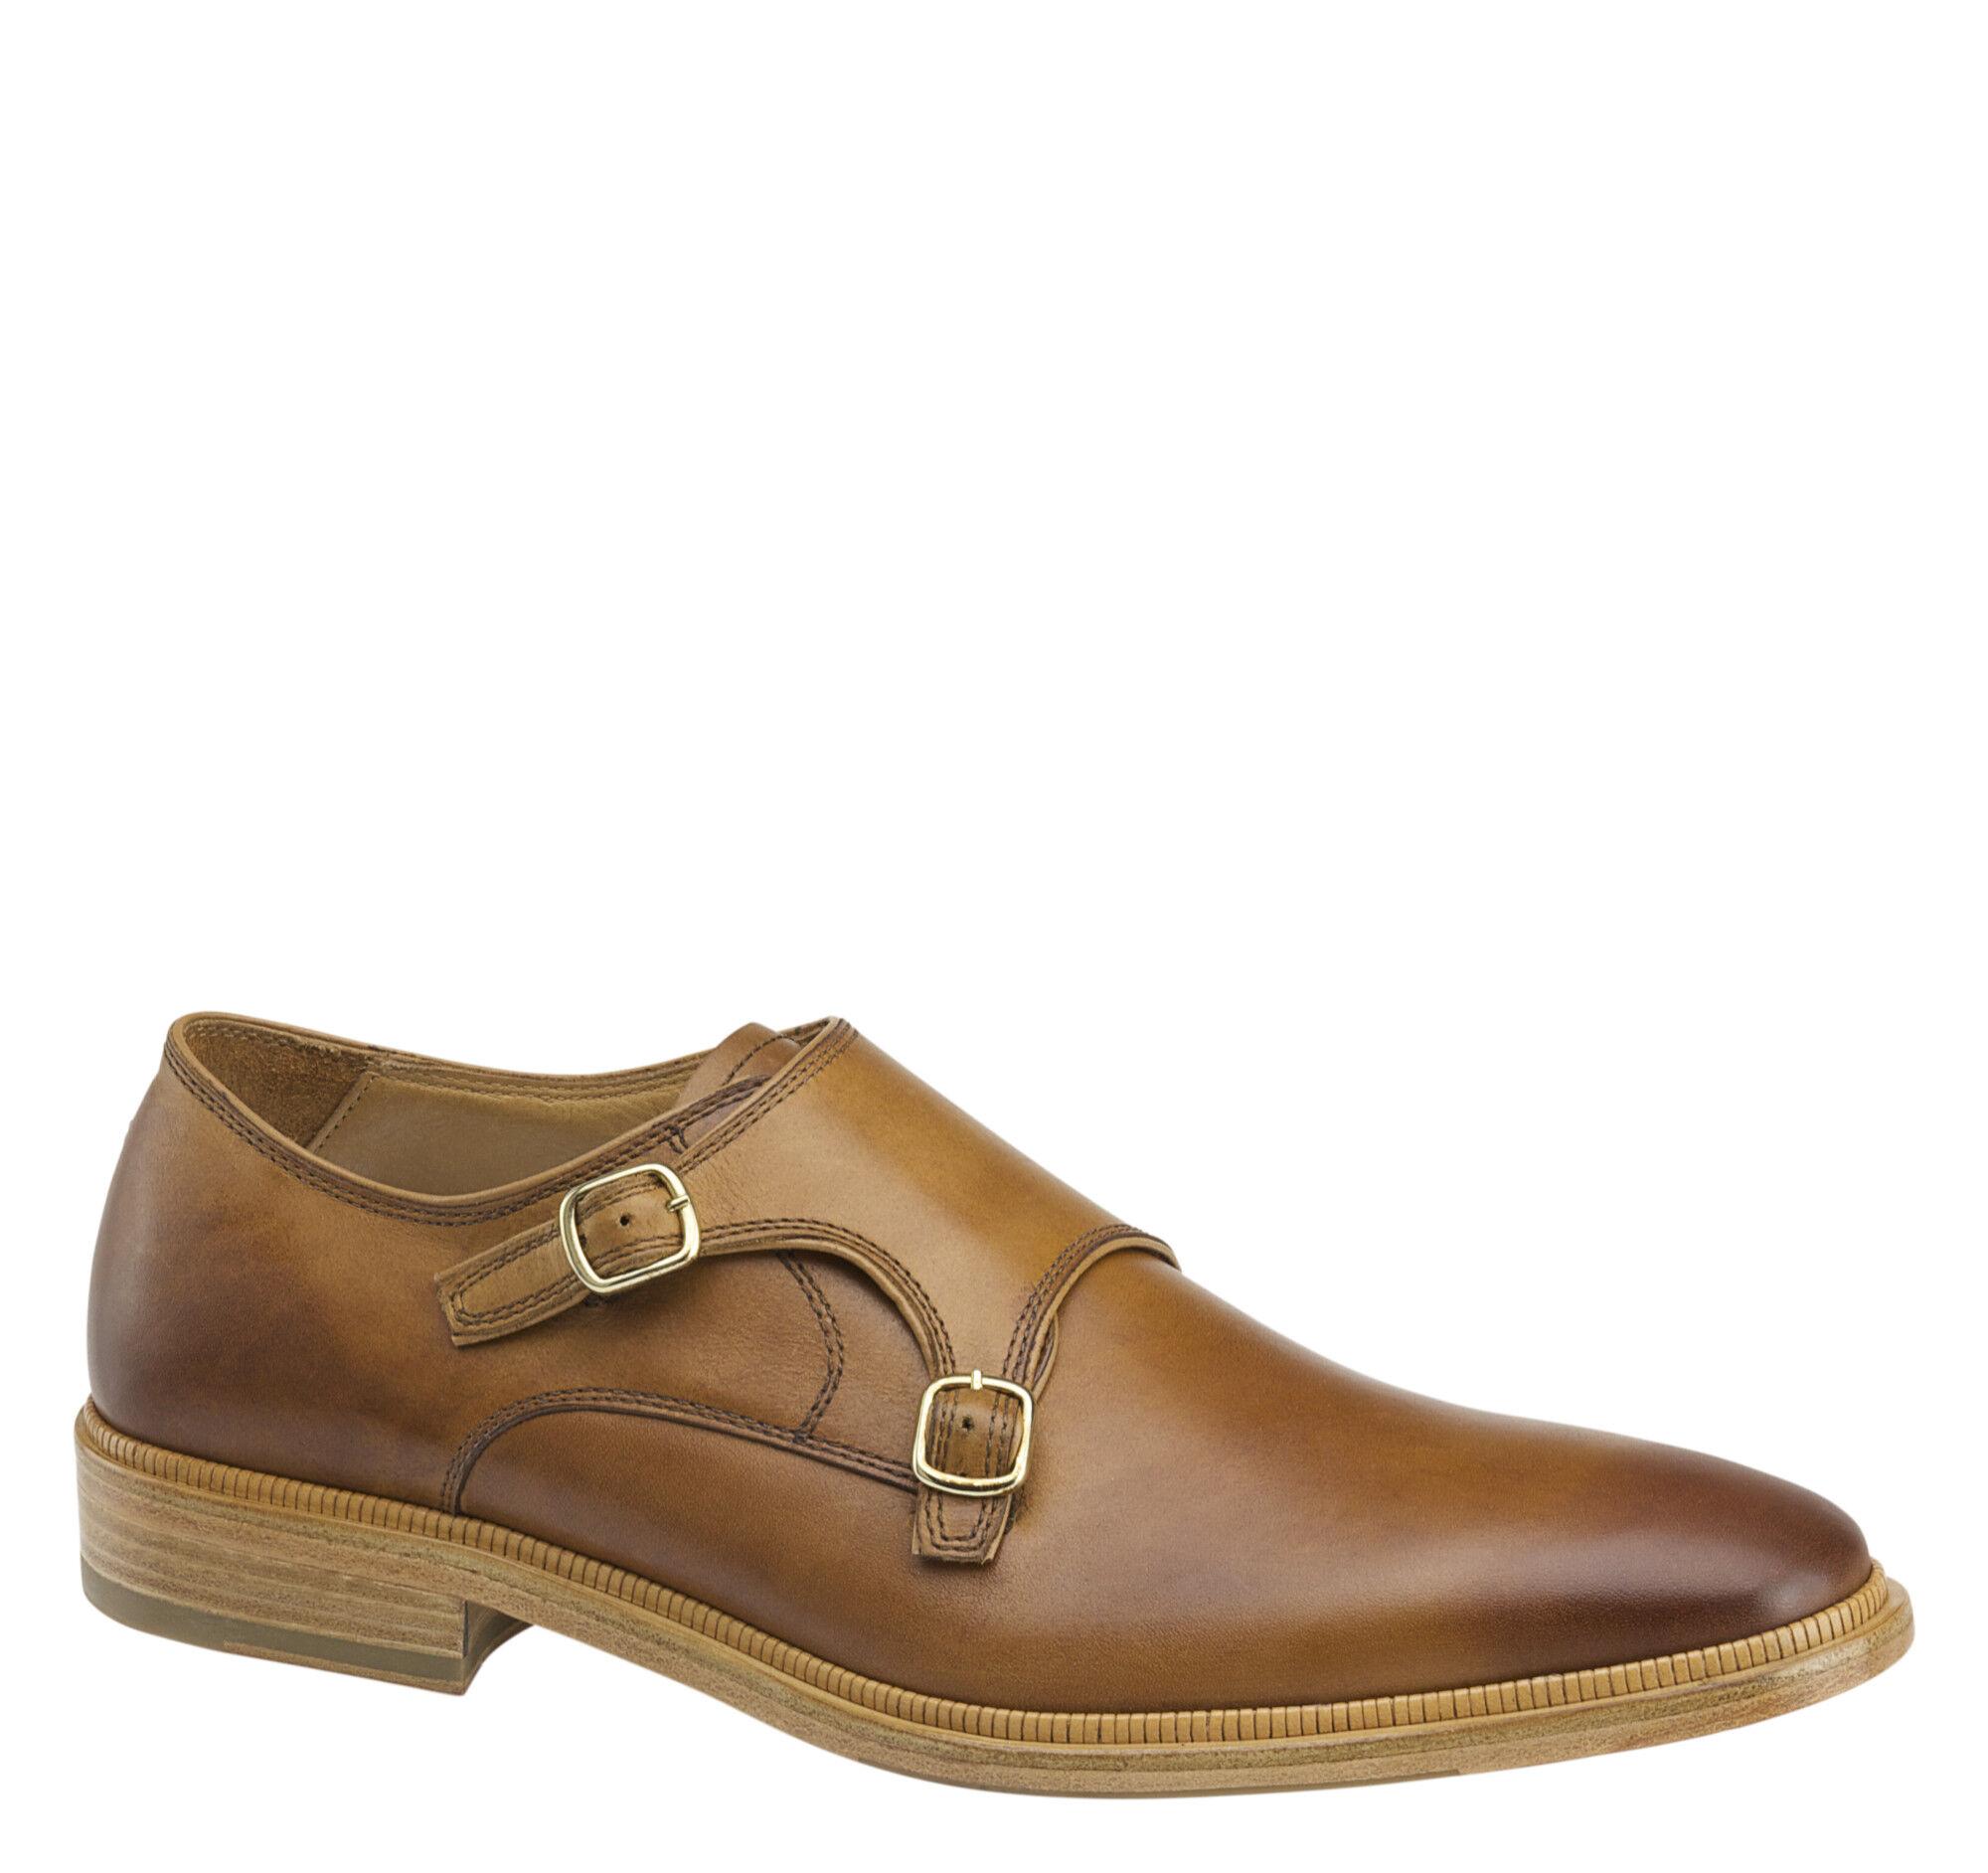 Whitman S Shoes